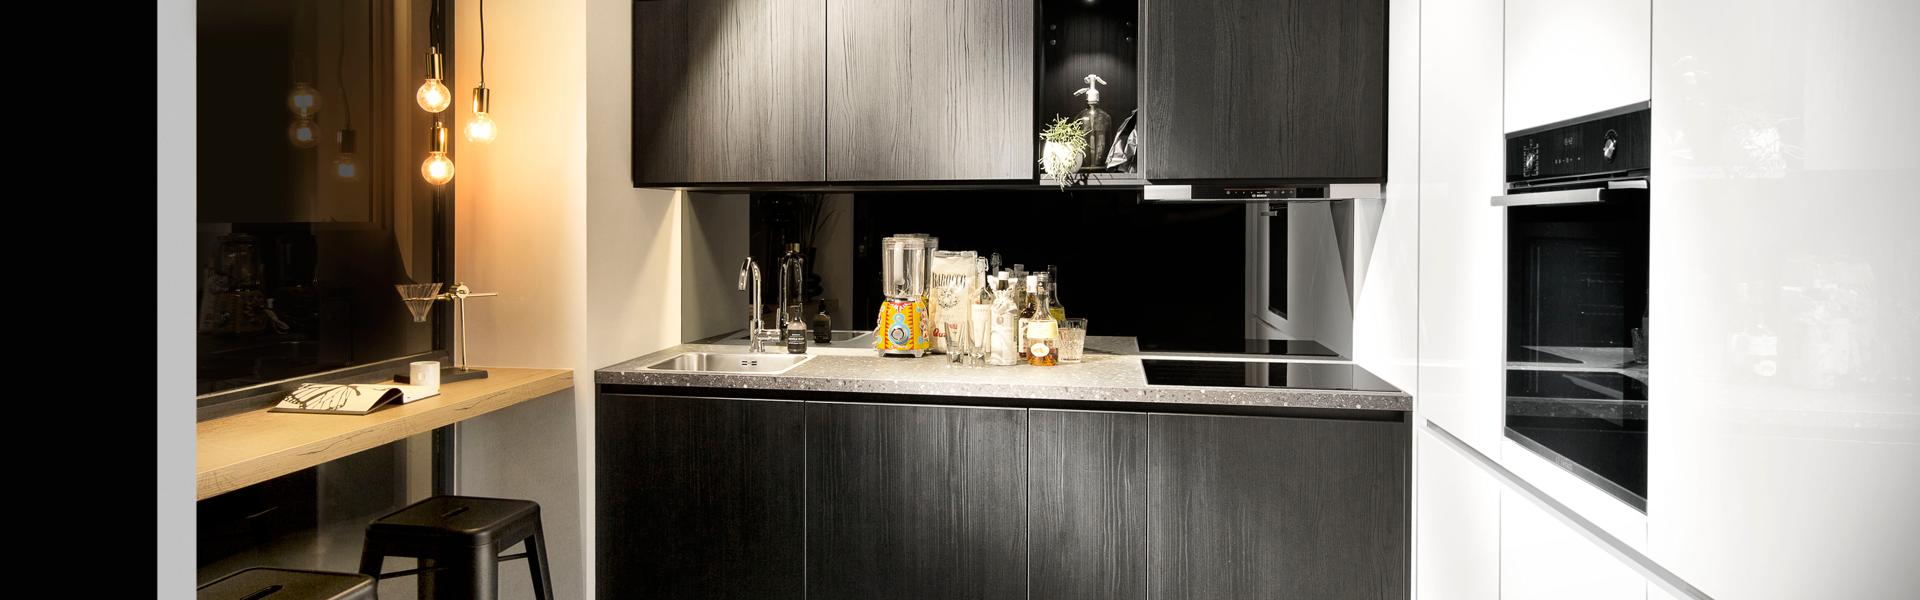 Unieke u-keukens | Eigenhuis Keukens